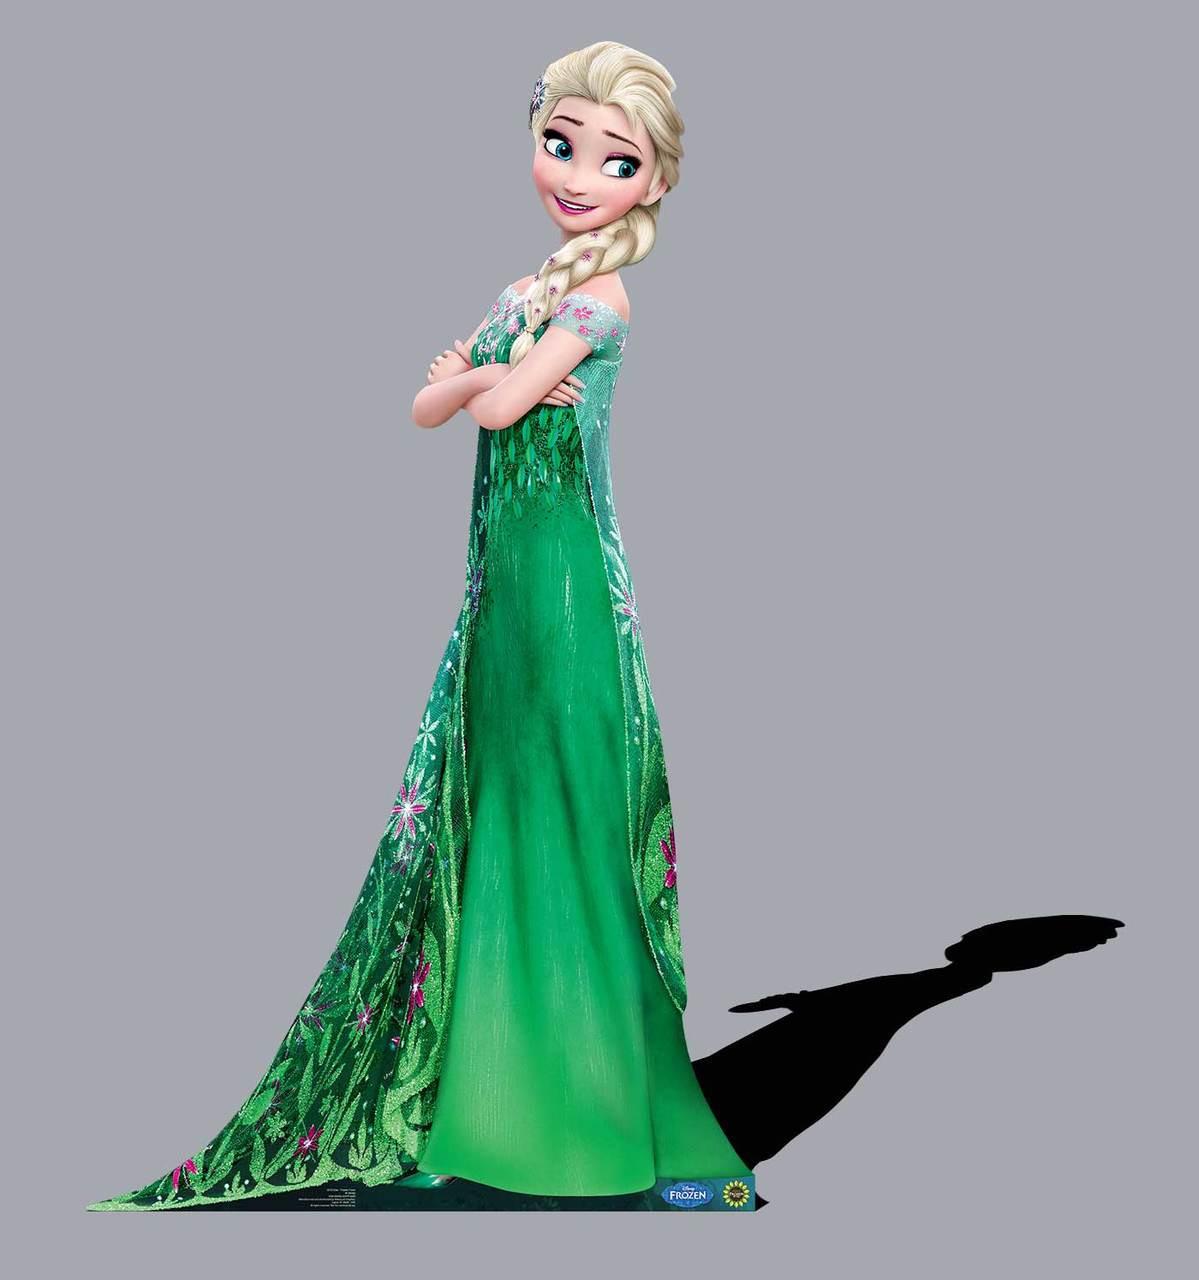 Life-size Elsa - Frozen Fever Cardboard Standup